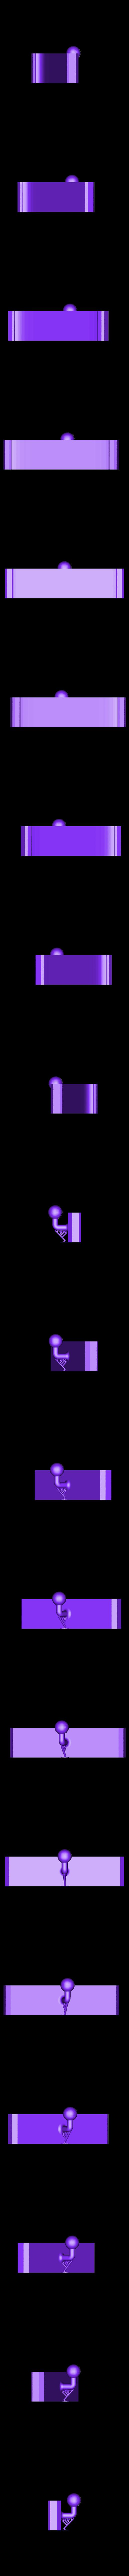 NEX7_Mount_Vertical_SUPPORTED.STL Download free STL file IKEA TERTIAL lamp Nexus 7 (2013) mount • 3D printer model, Werthrante